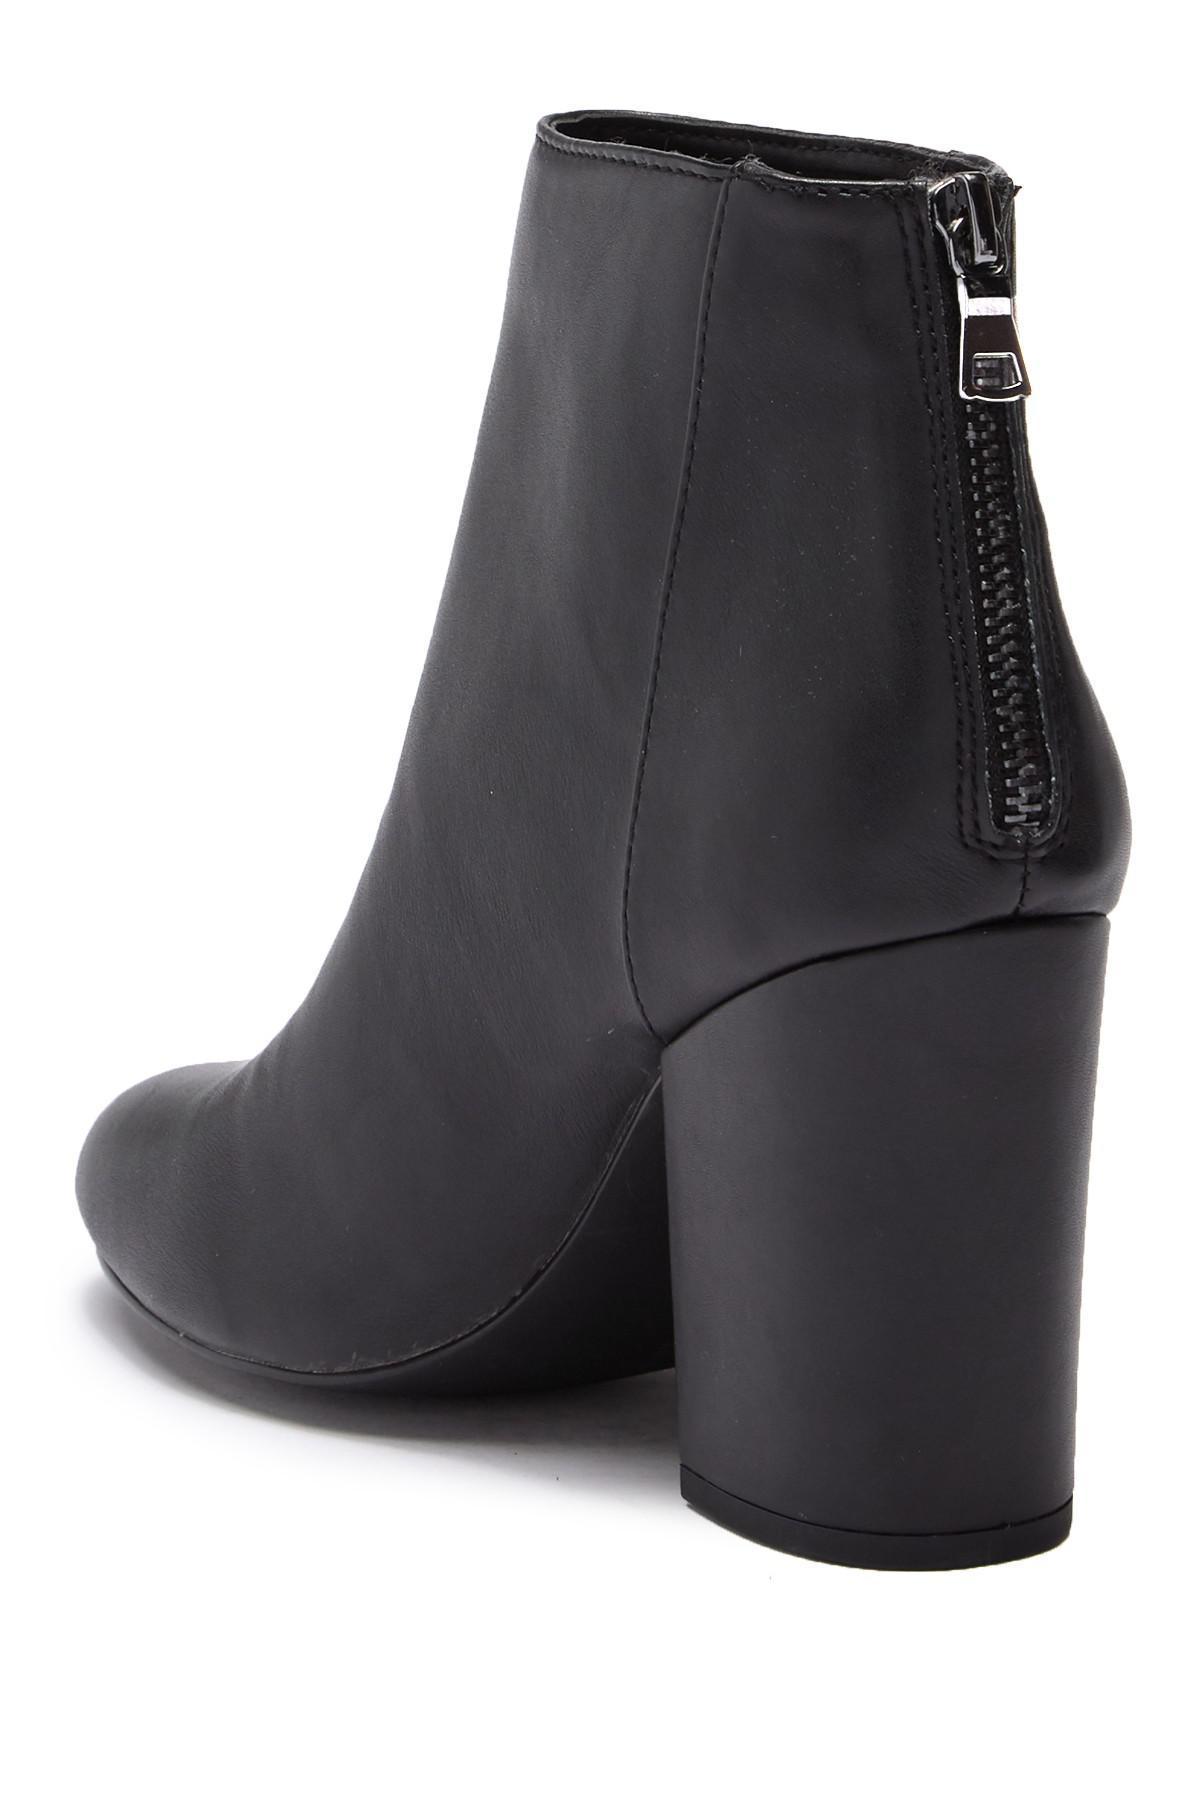 e083b5cdc064 Lyst - Steve Madden Shade Block Heel Boot in Black